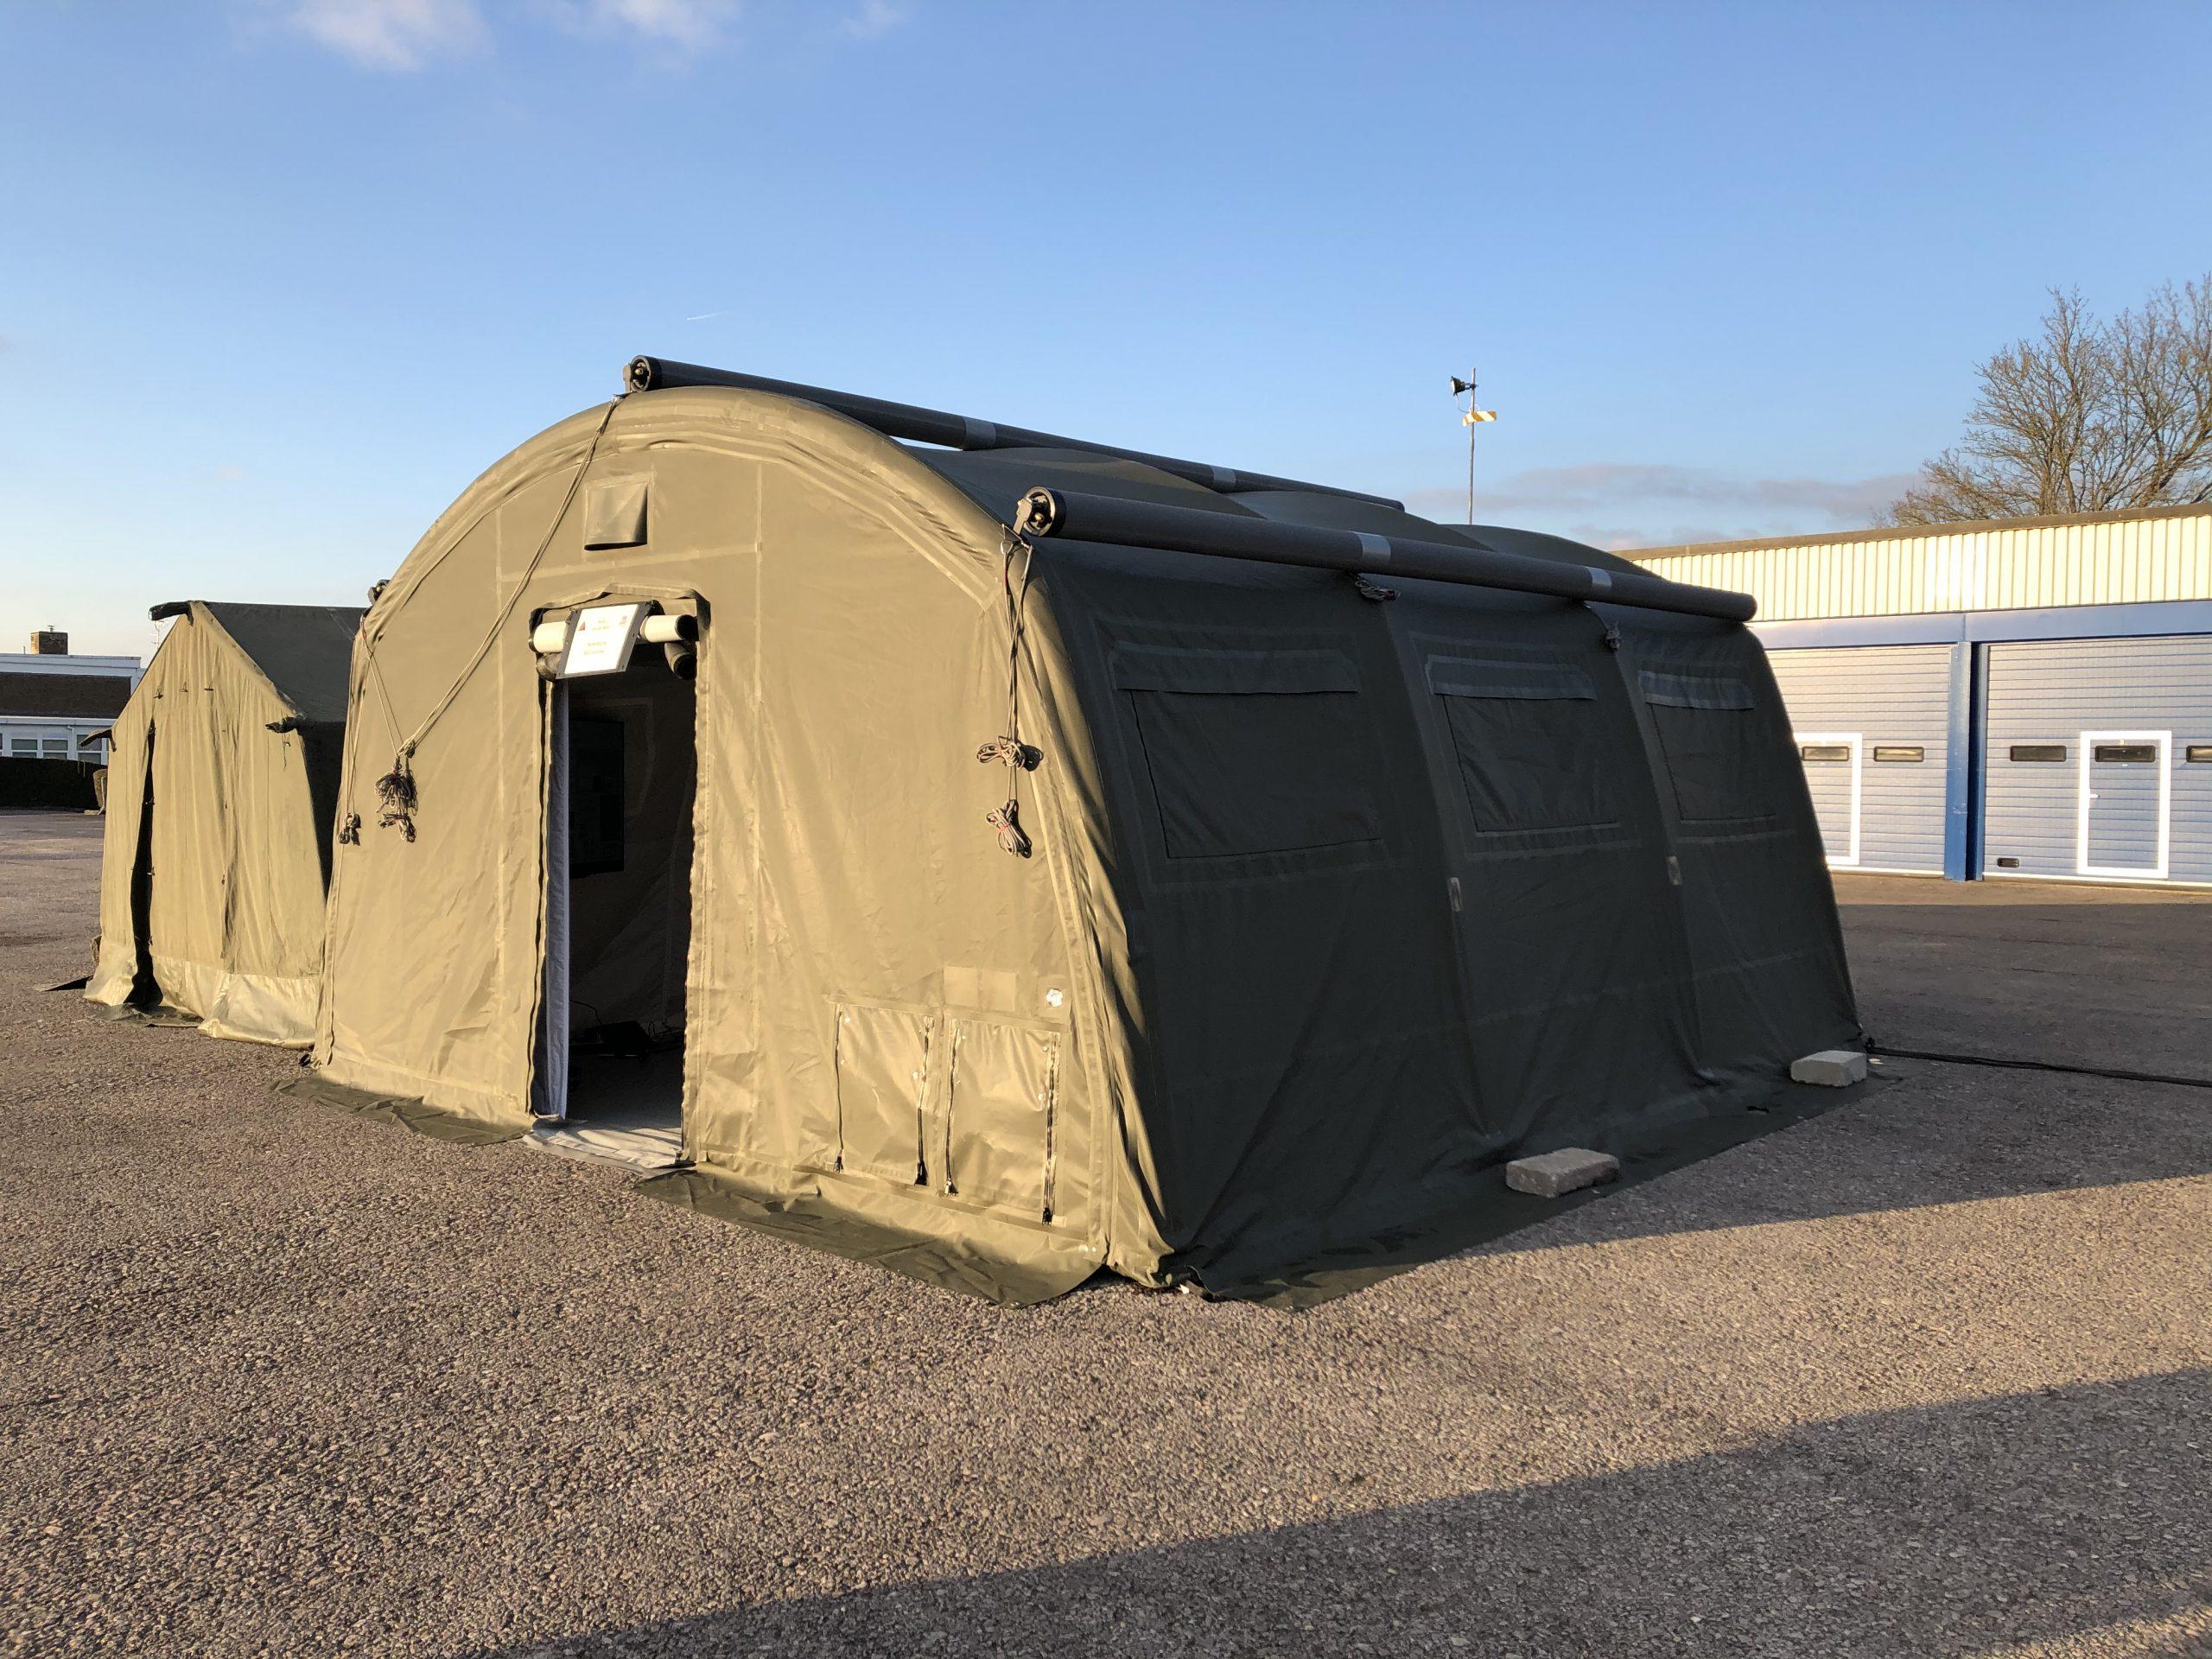 2 x NIXUS ERA Tents supplied to British Army